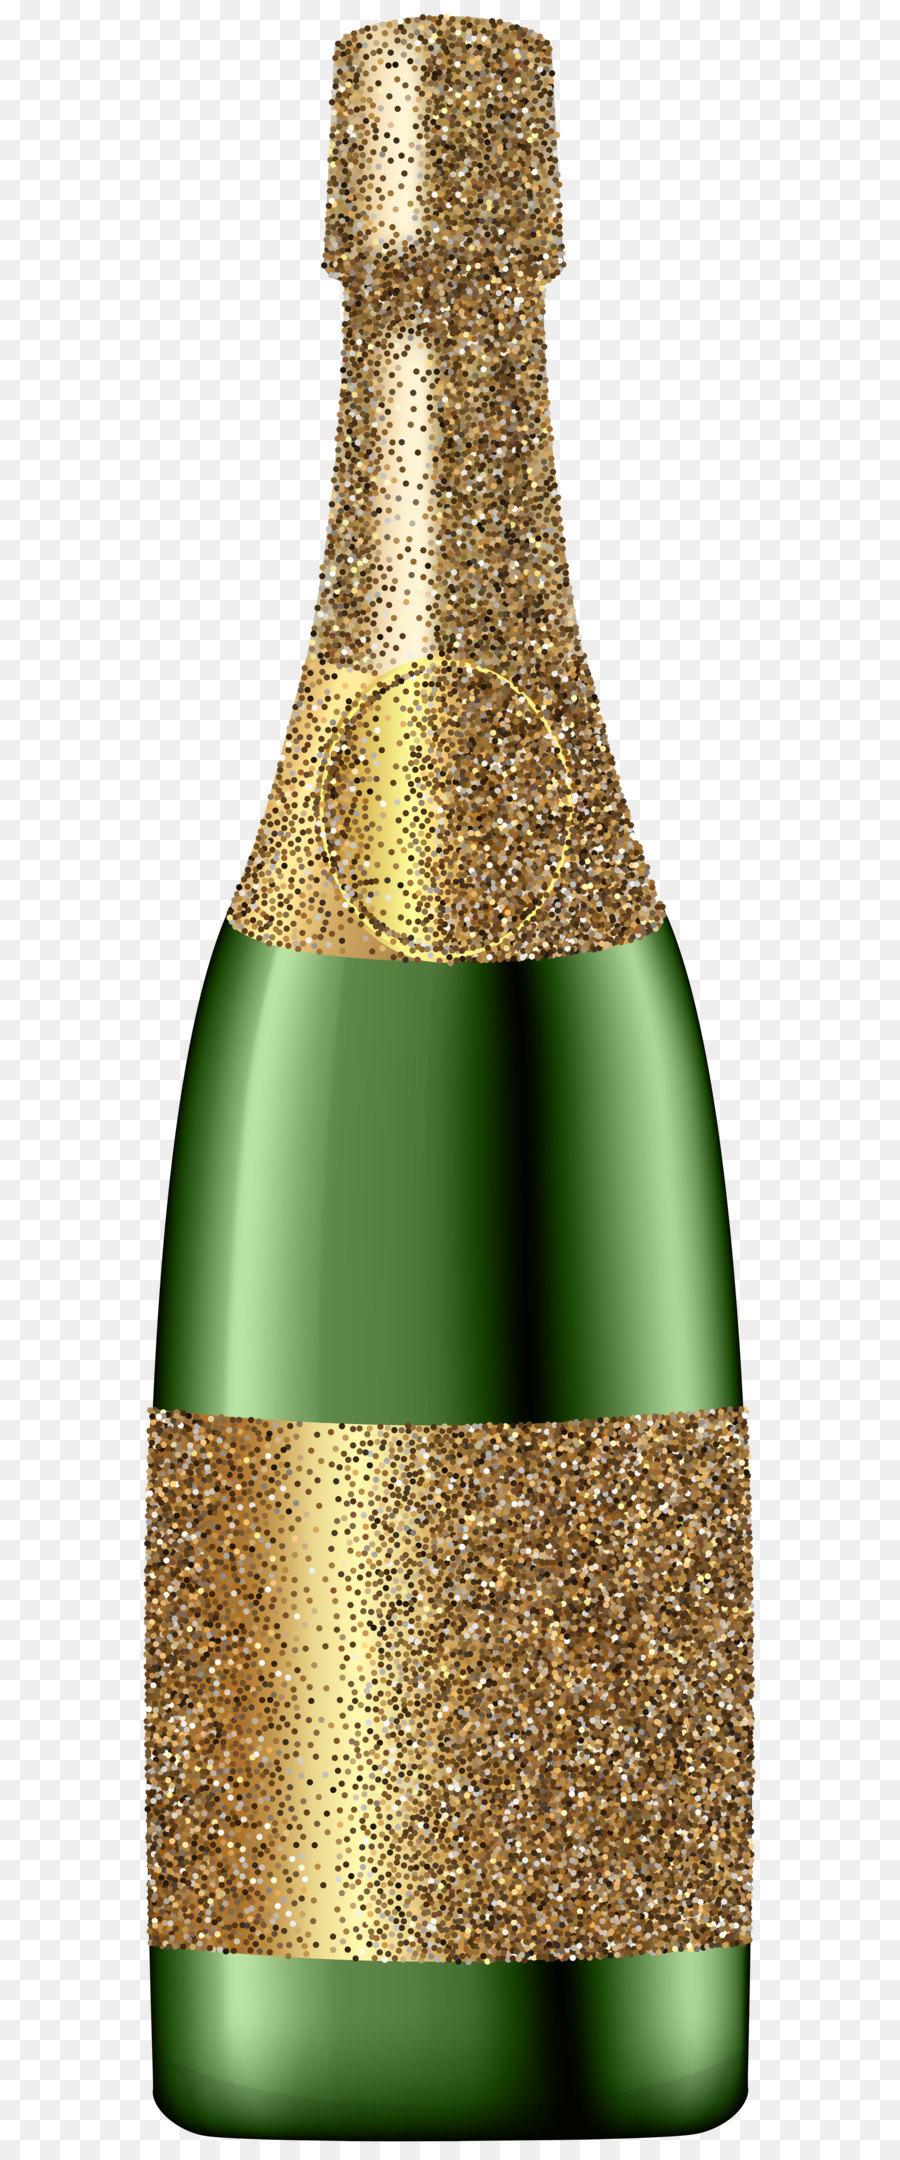 red wine champagne bottle clip art glitter champagne bottle png rh kisspng com champagne bottle popping clipart champagne bottle clipart